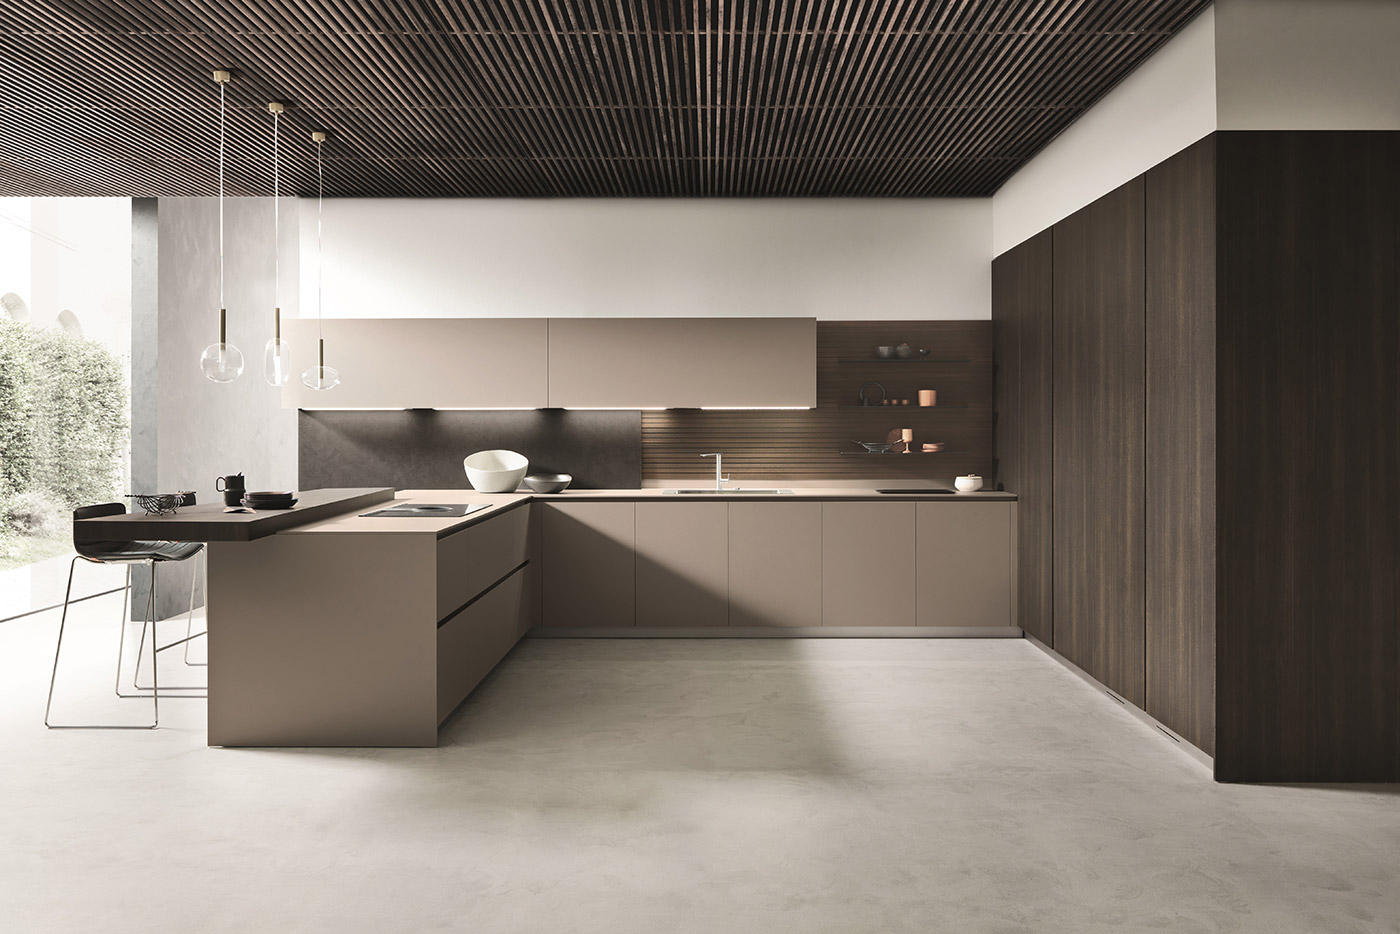 Pedini Pdx Italian Modern Kitchen Bath Cabinets Portland Oregon